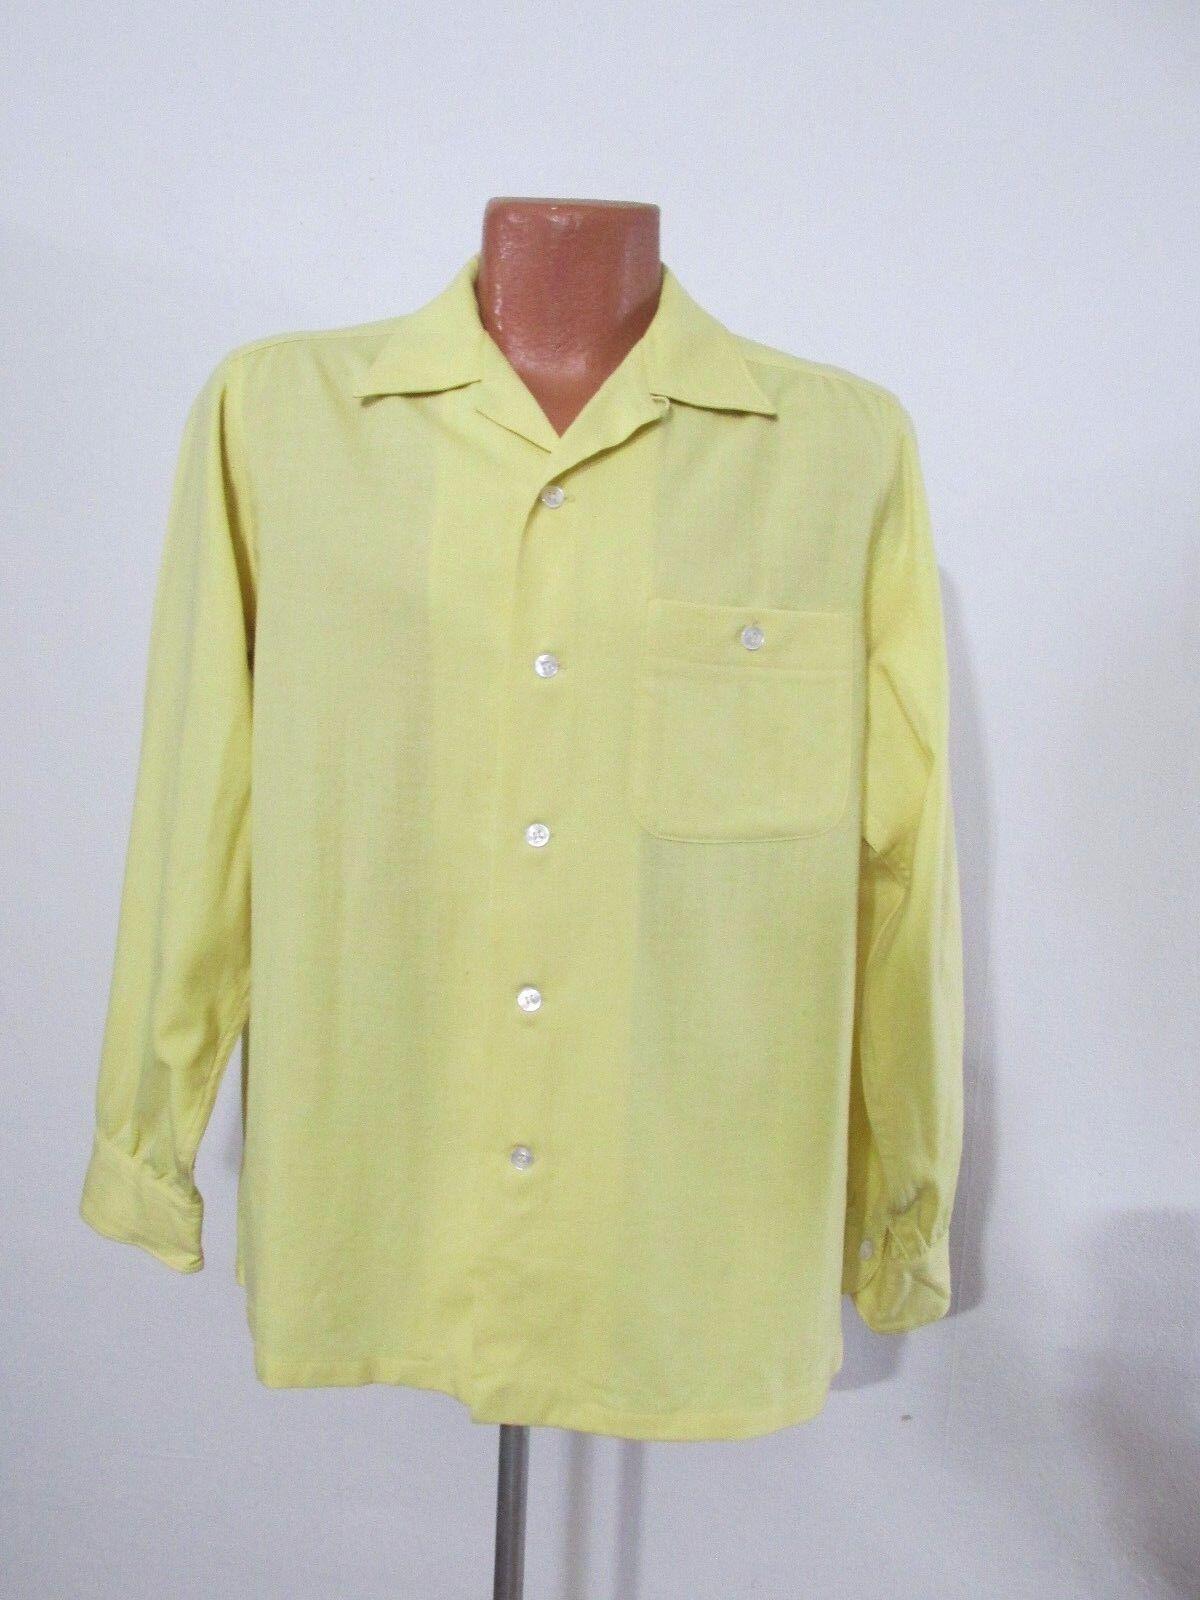 Sir Pendleton Shirt Yellow Wool  Antique 1960's USA  Shirt Men's Med Inv v6666